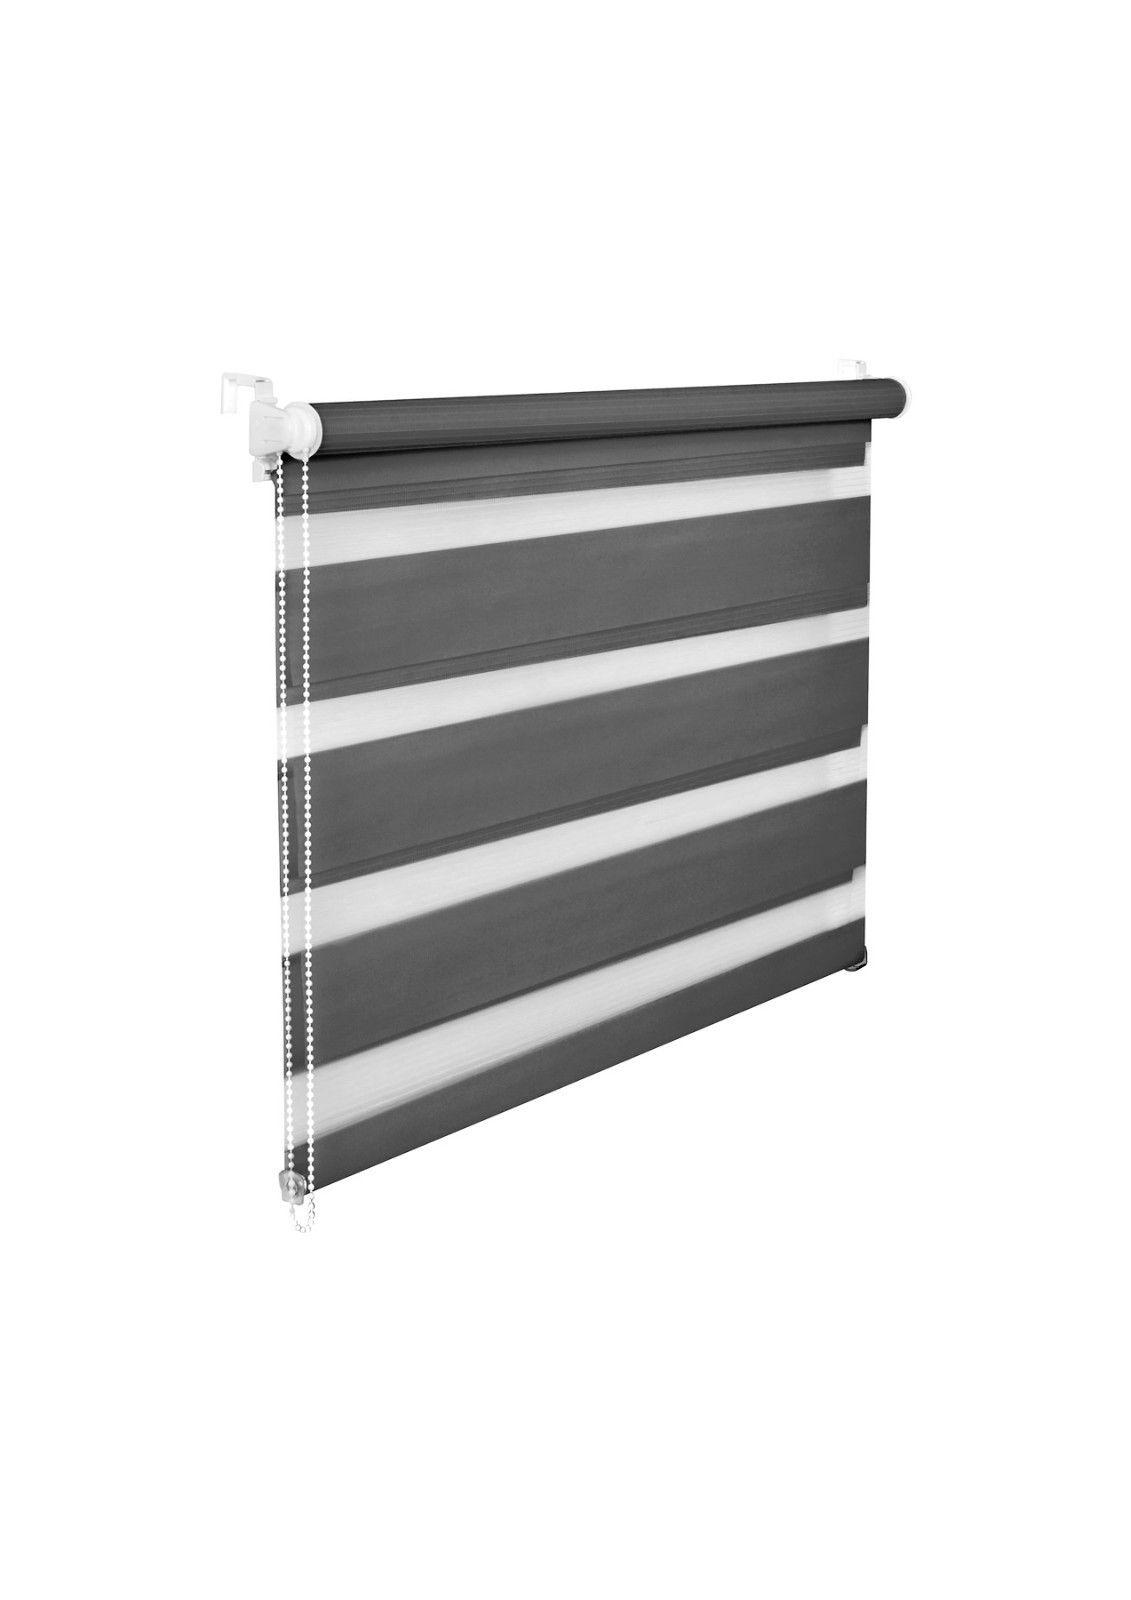 doppelrollo duorollo 200 cm l nge fensterrollo jalousie schwarz weiss grau rot ebay. Black Bedroom Furniture Sets. Home Design Ideas